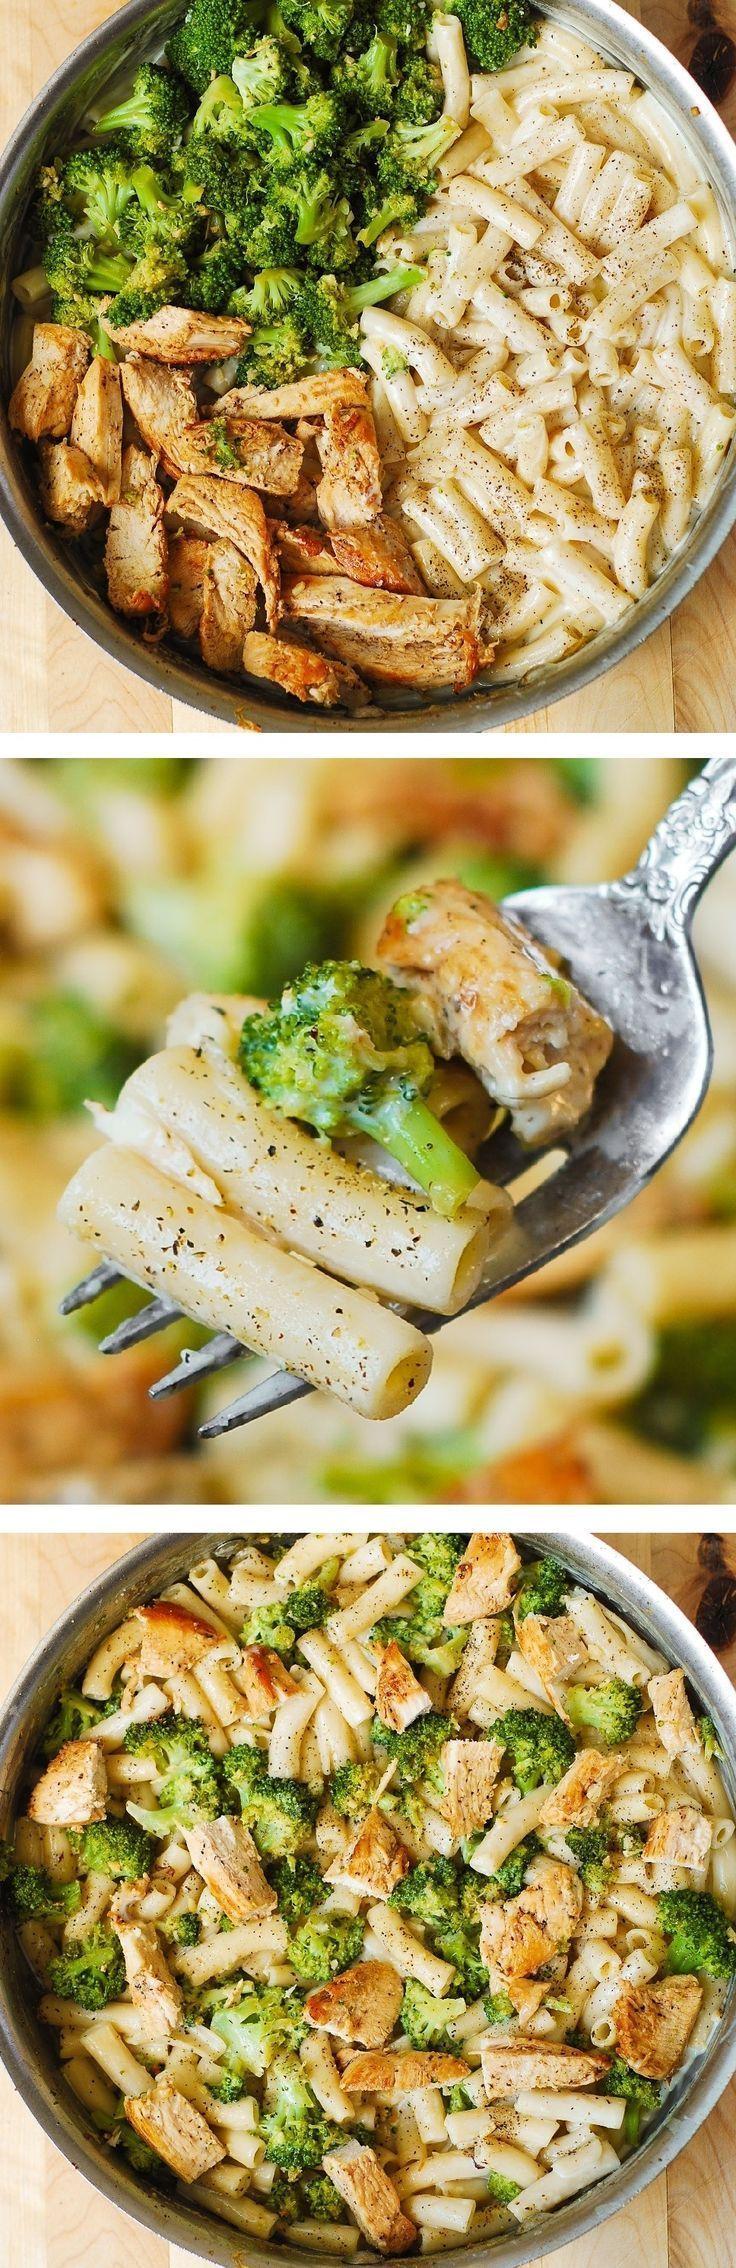 Chicken Broccoli Alfredo Penne Pasta  With homemade white cheese cream sauce.